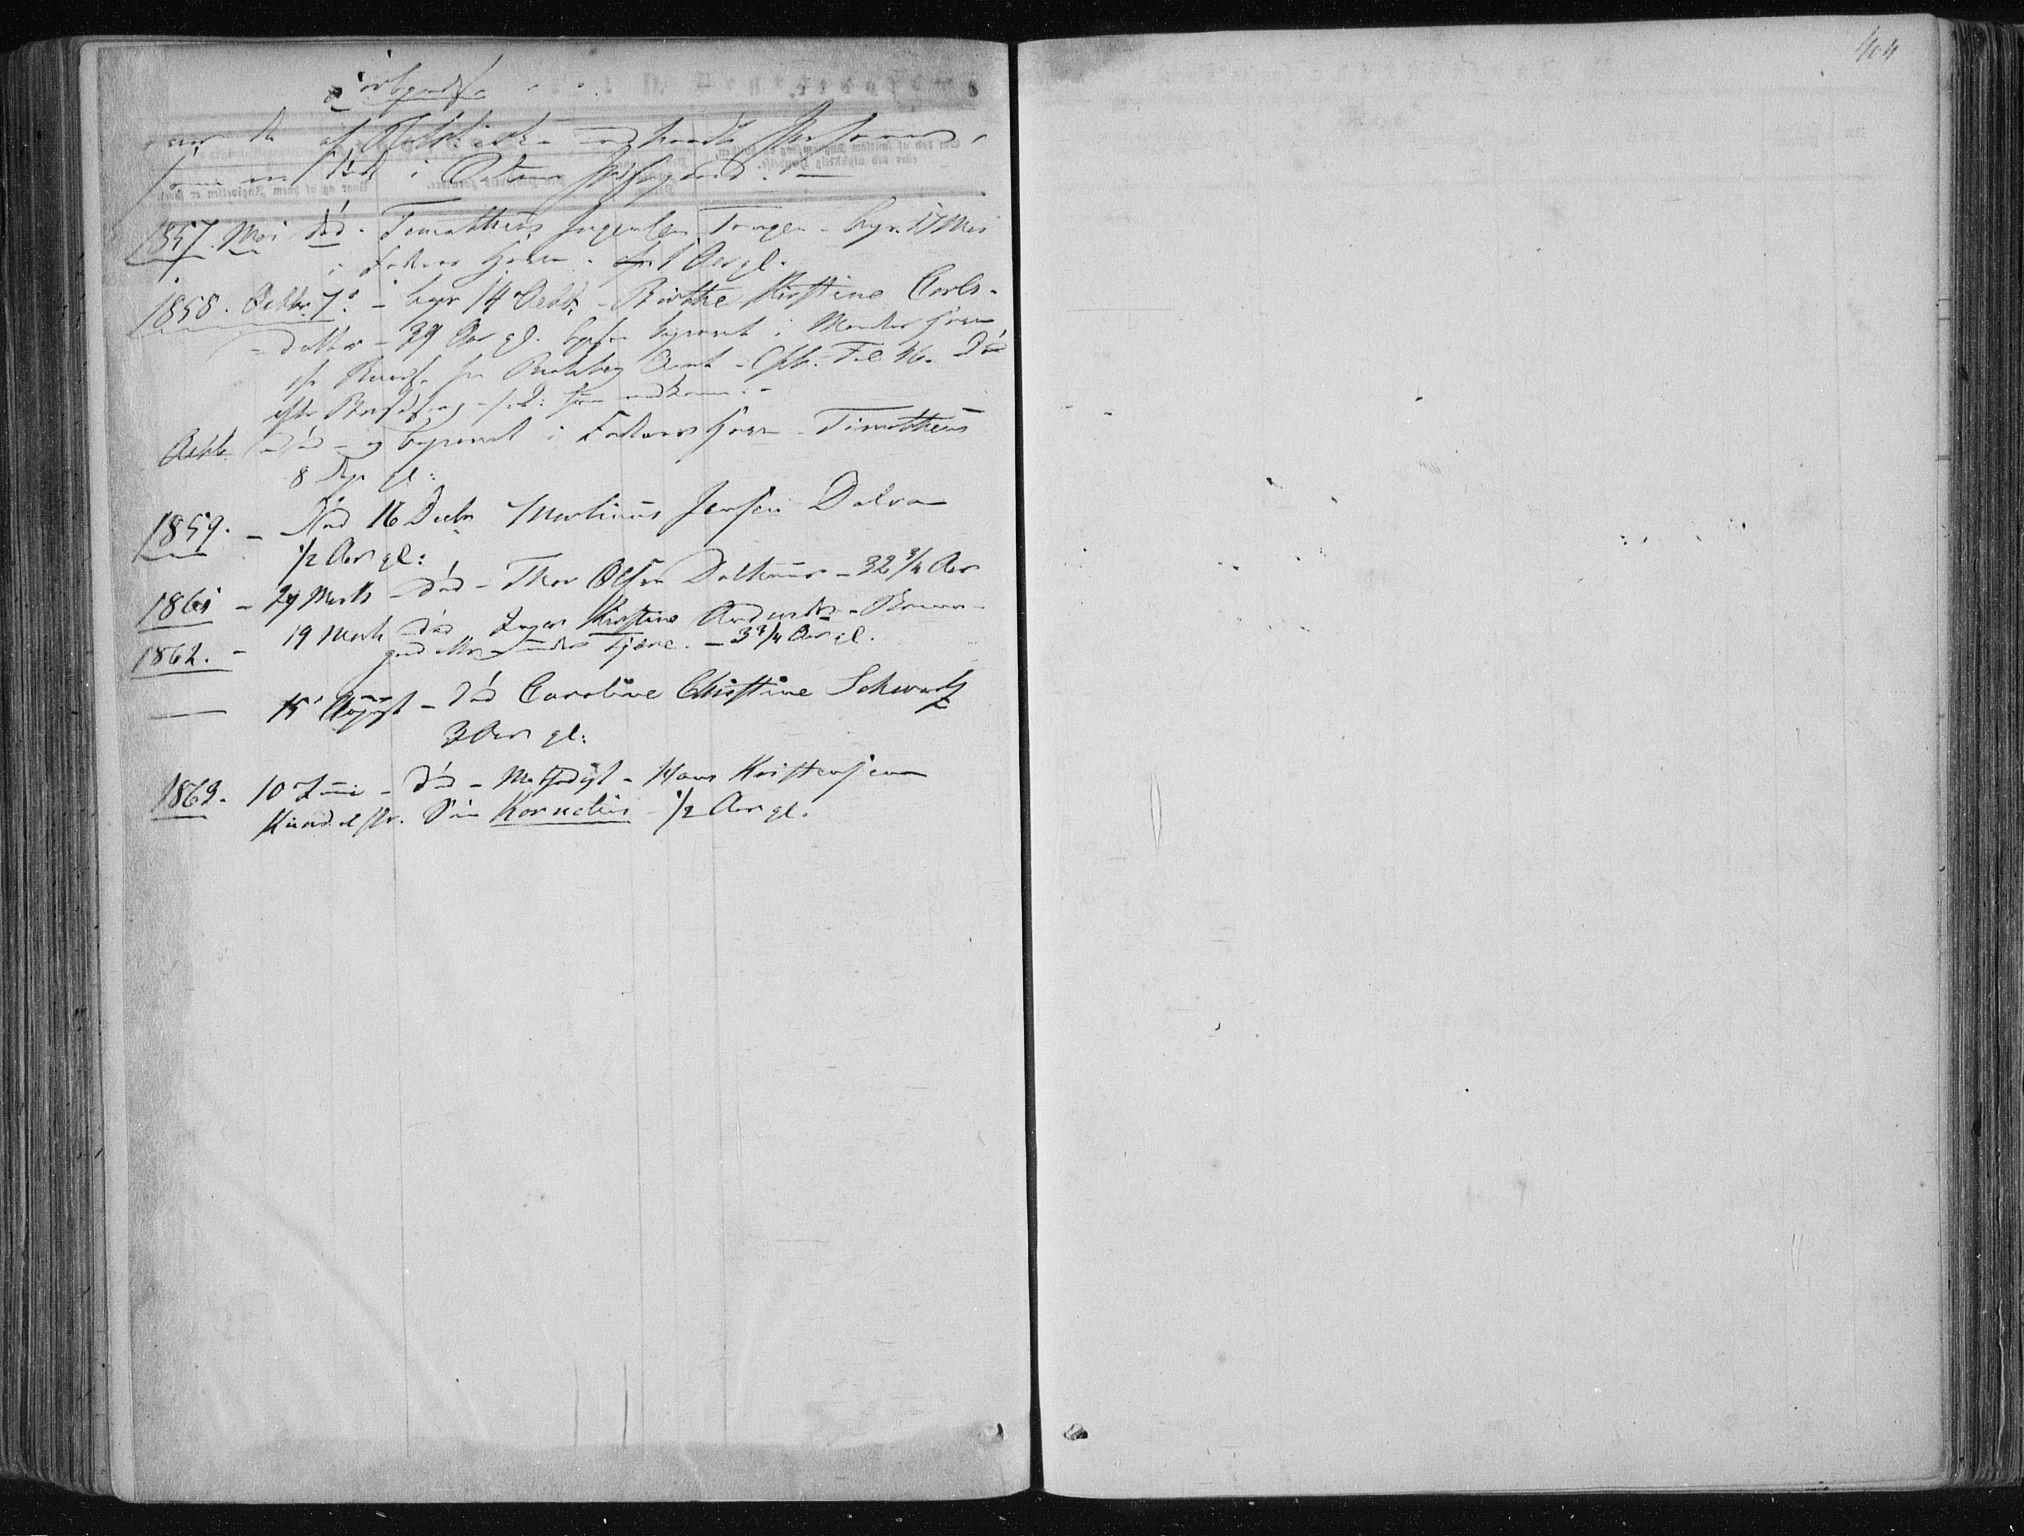 SAKO, Solum kirkebøker, F/Fa/L0007: Ministerialbok nr. I 7, 1856-1864, s. 404